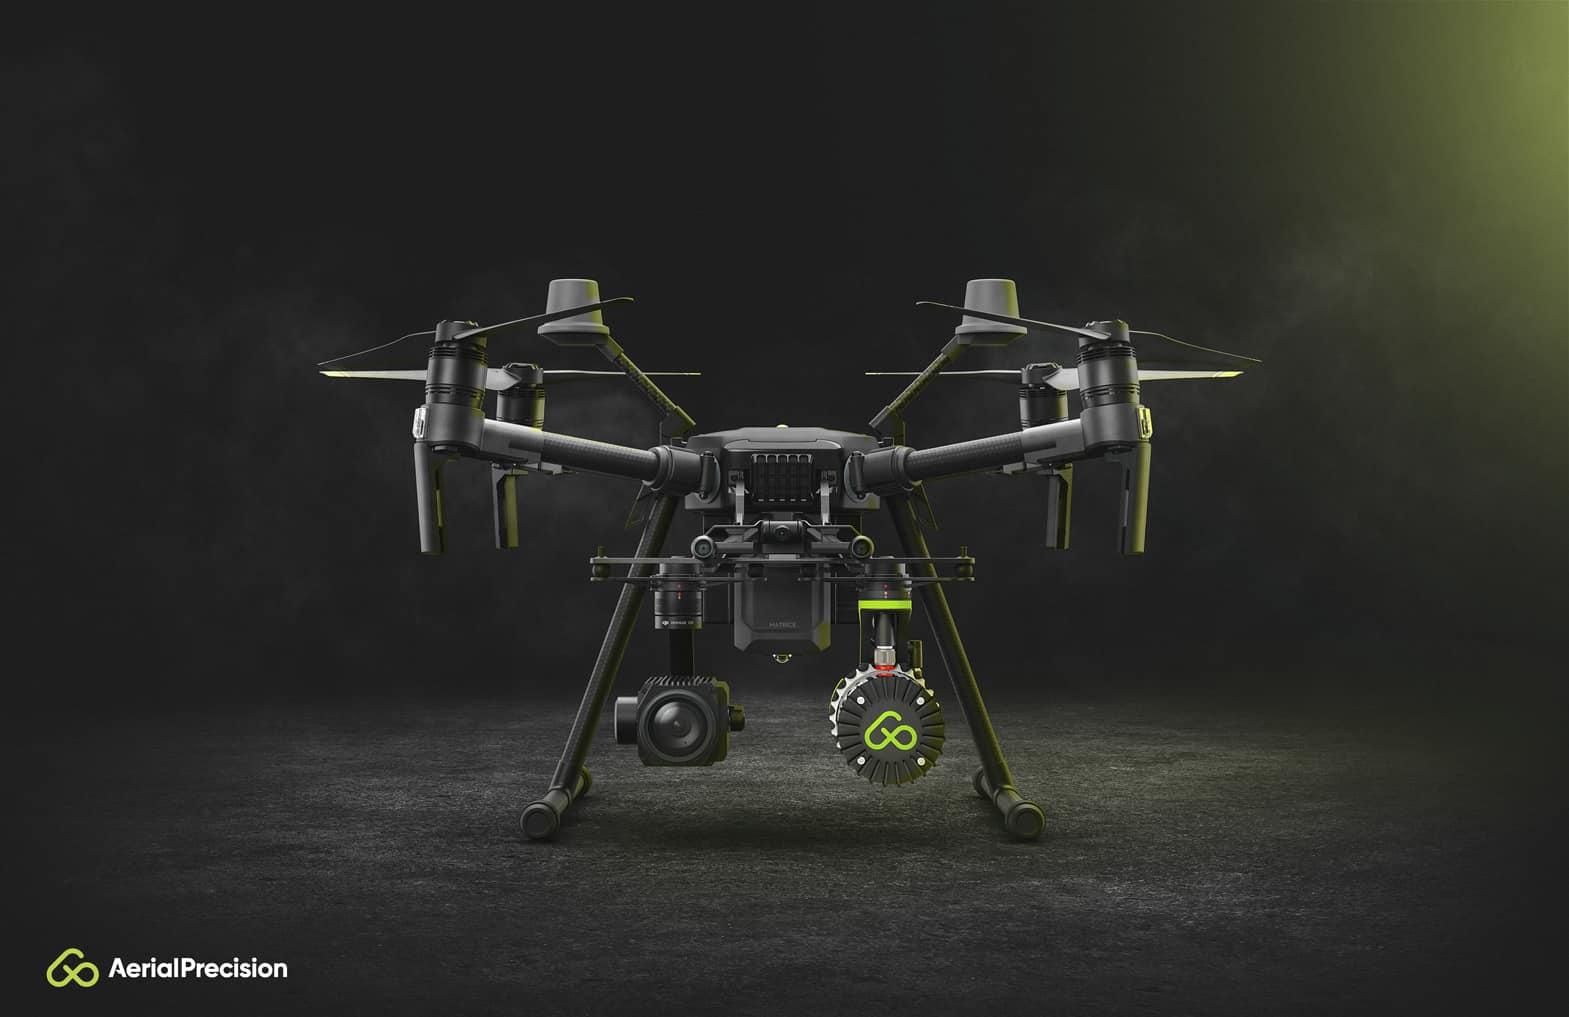 Aerial Precision - Drone - Tech Marketing